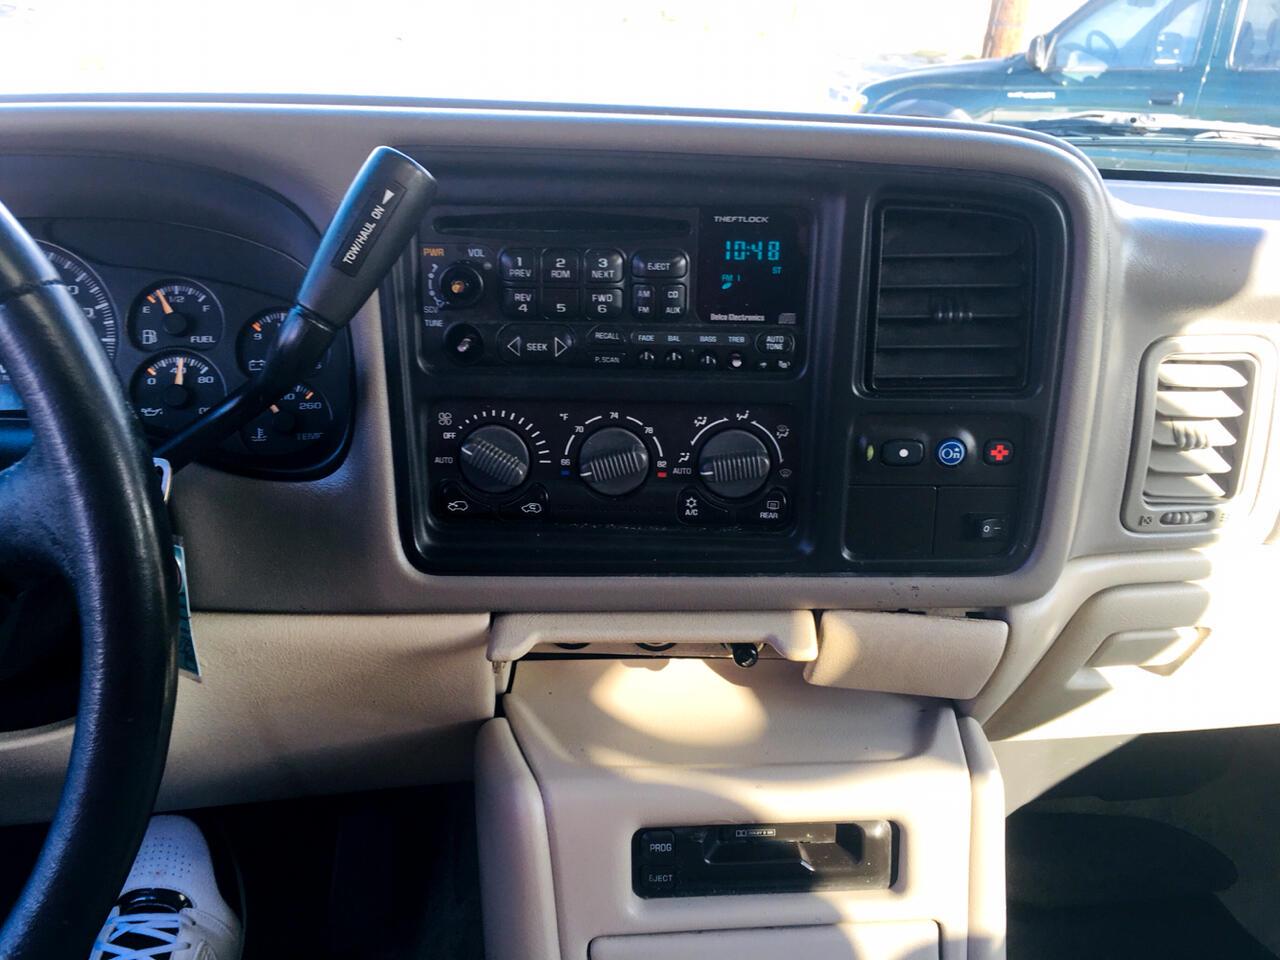 2002 GMC Yukon XL 1500 2WD